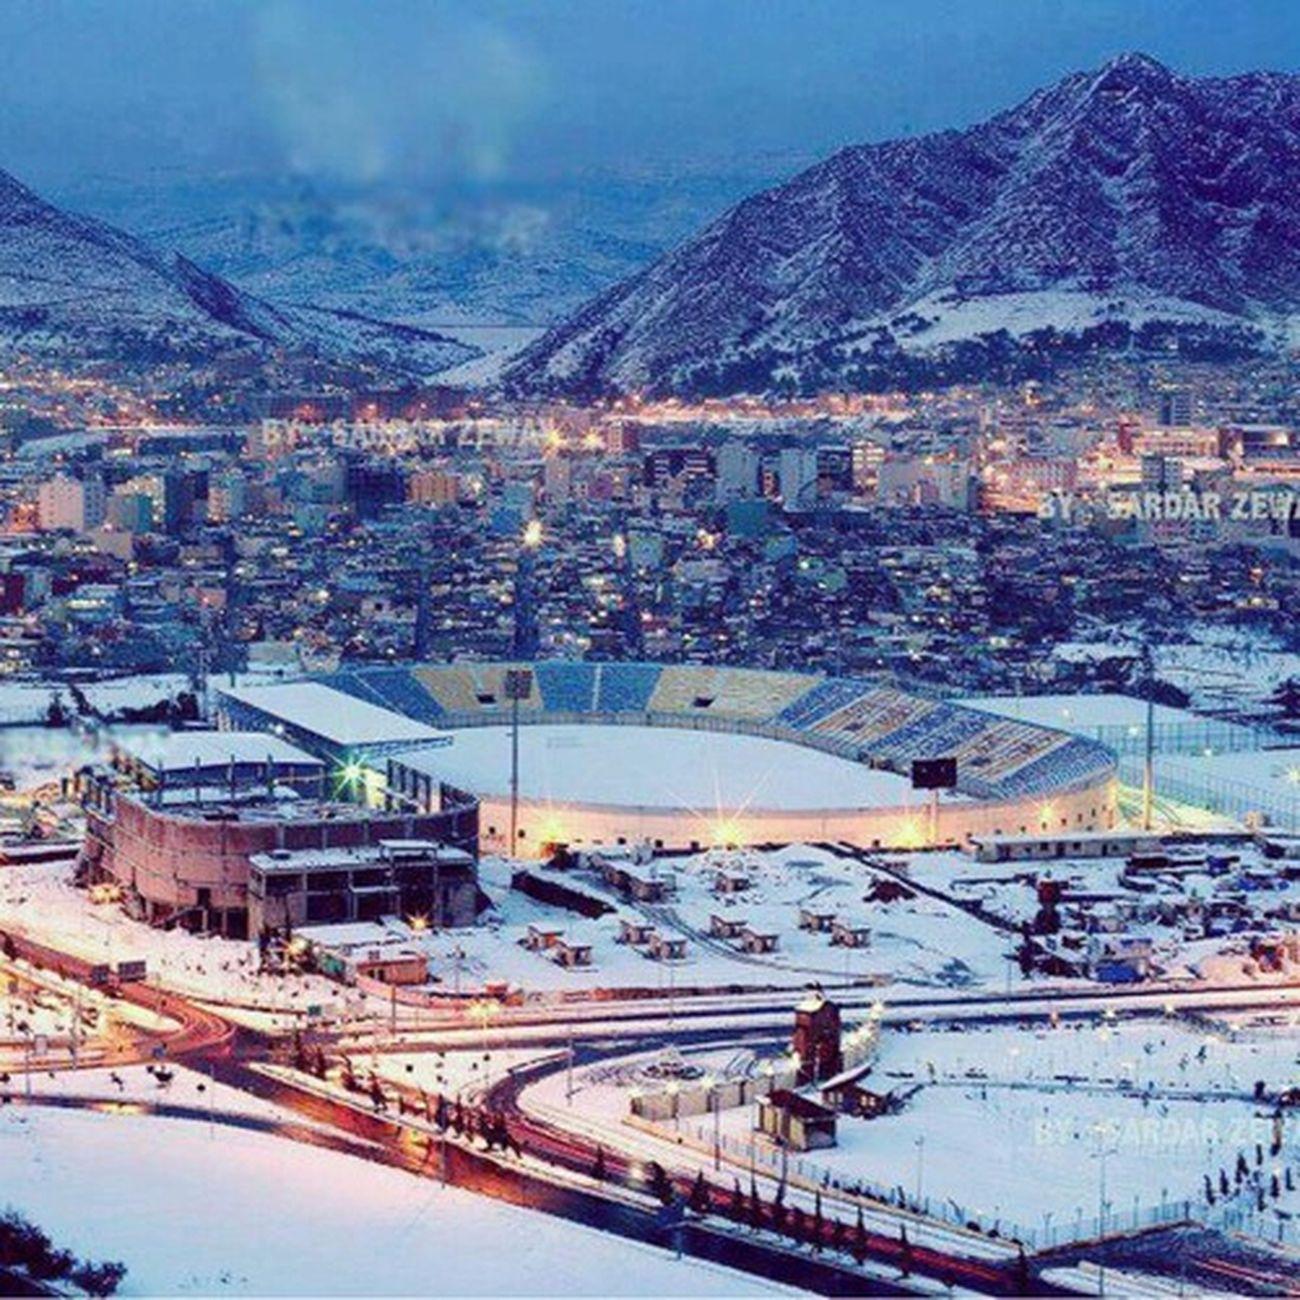 Hi! Hello World Photoshoot Nice Photo Taking Photos Buatifulduhoki Duhok Kurdistan I ♥ Kurdistan 😉😊😊✋ Ioveyou duhoki